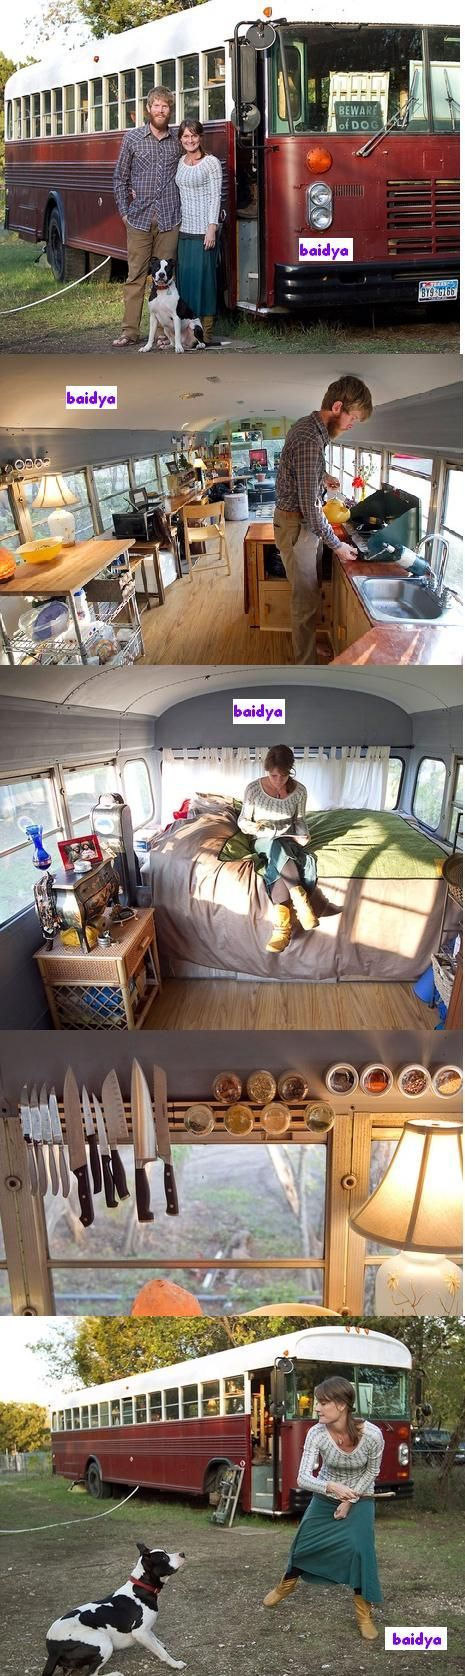 Genius Homemade hammock hangs above the front seats Sturdy - k amp uuml che ikea kosten